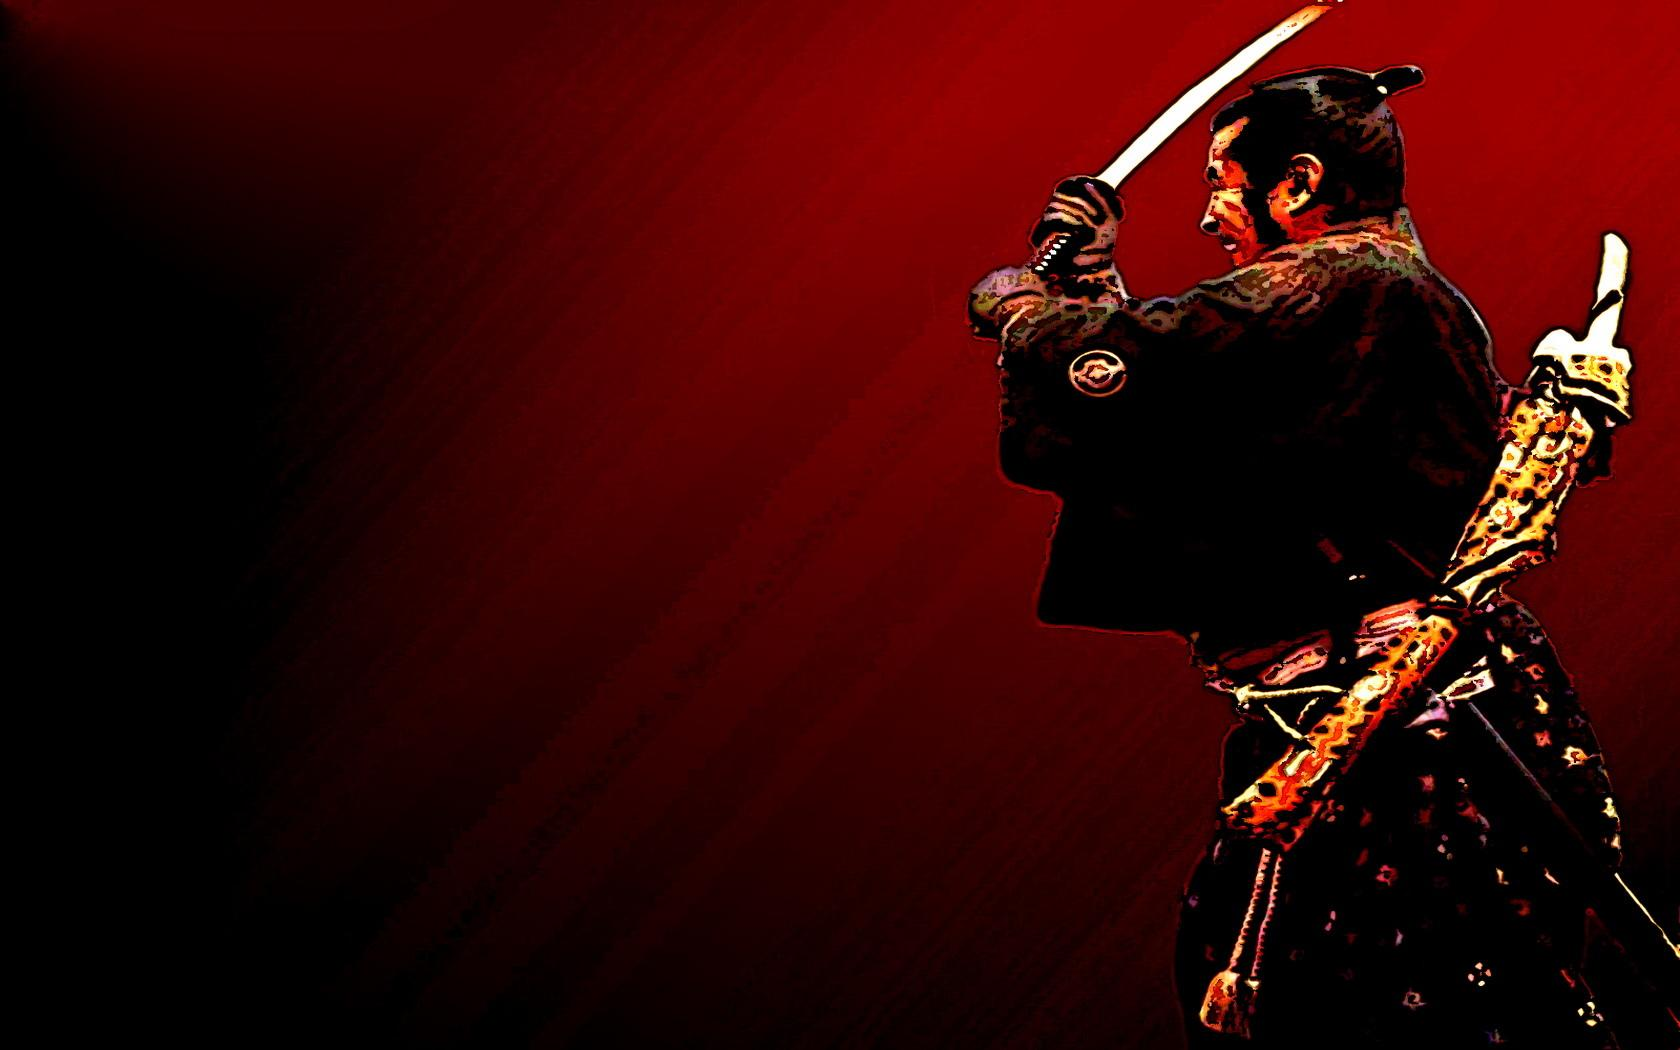 Samurai Artistic wallpapers HD quality